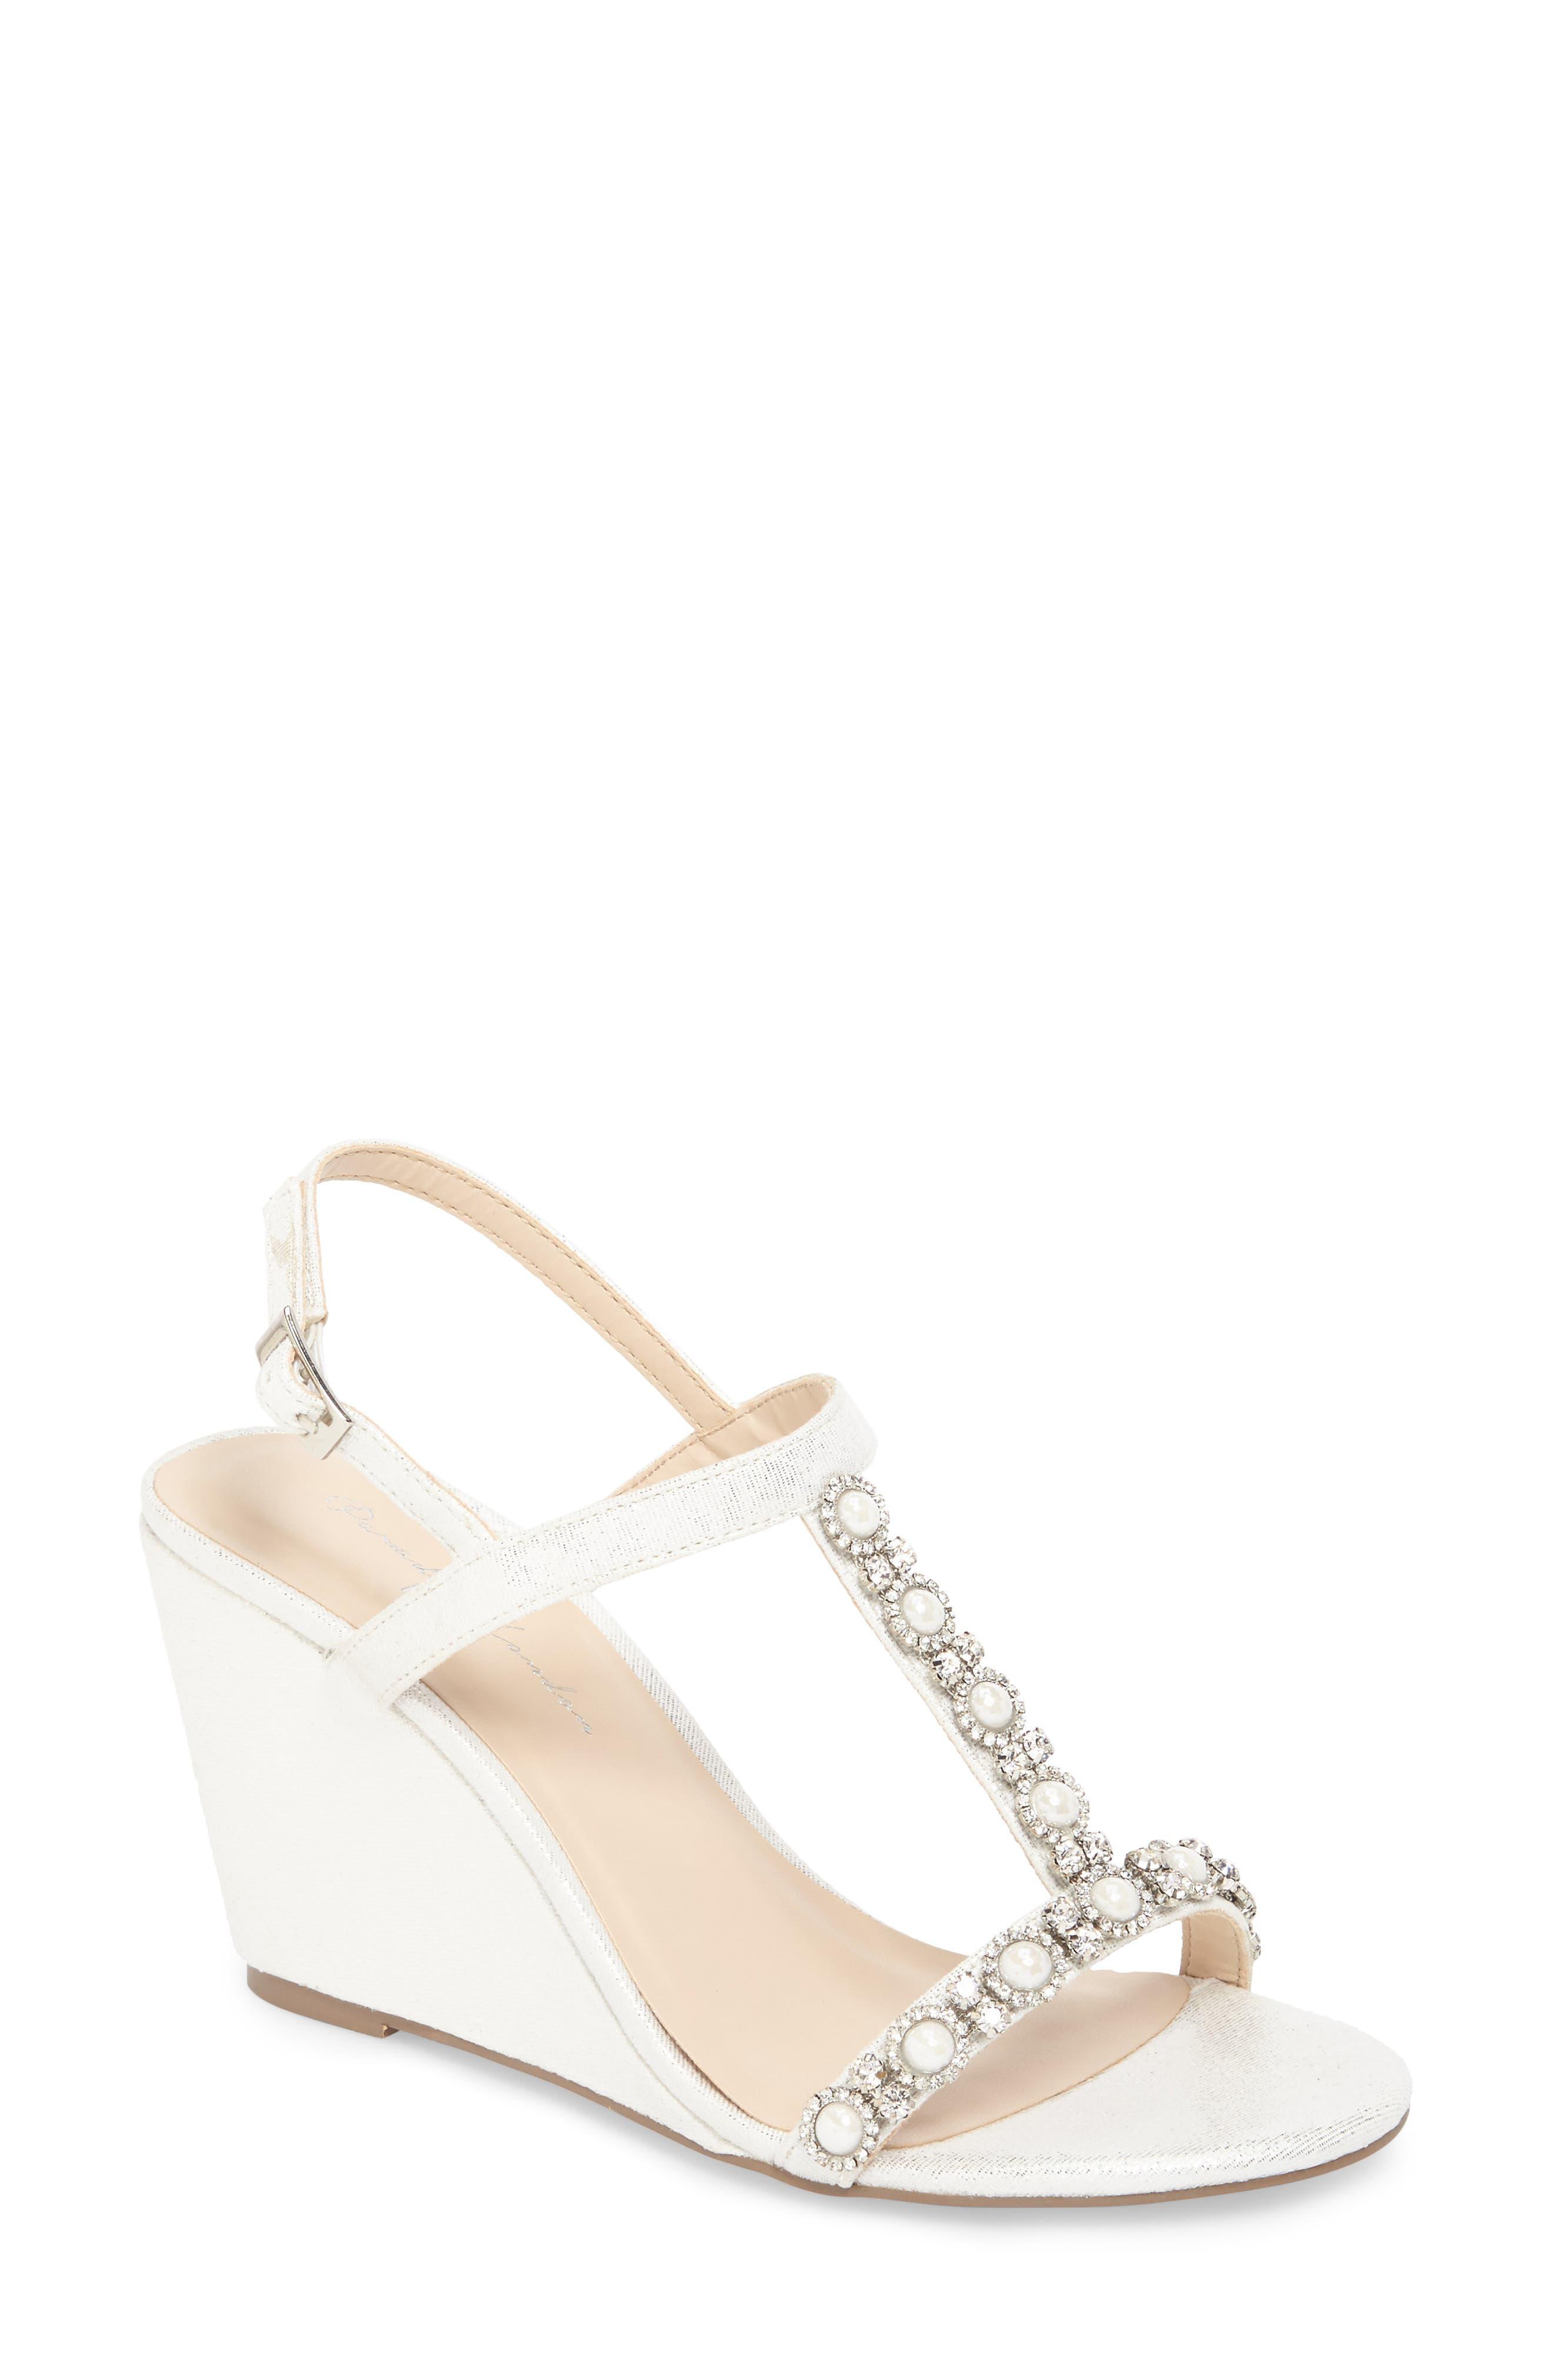 Kiana Embellished Wedge Sandal,                         Main,                         color, SILVER GLITTER